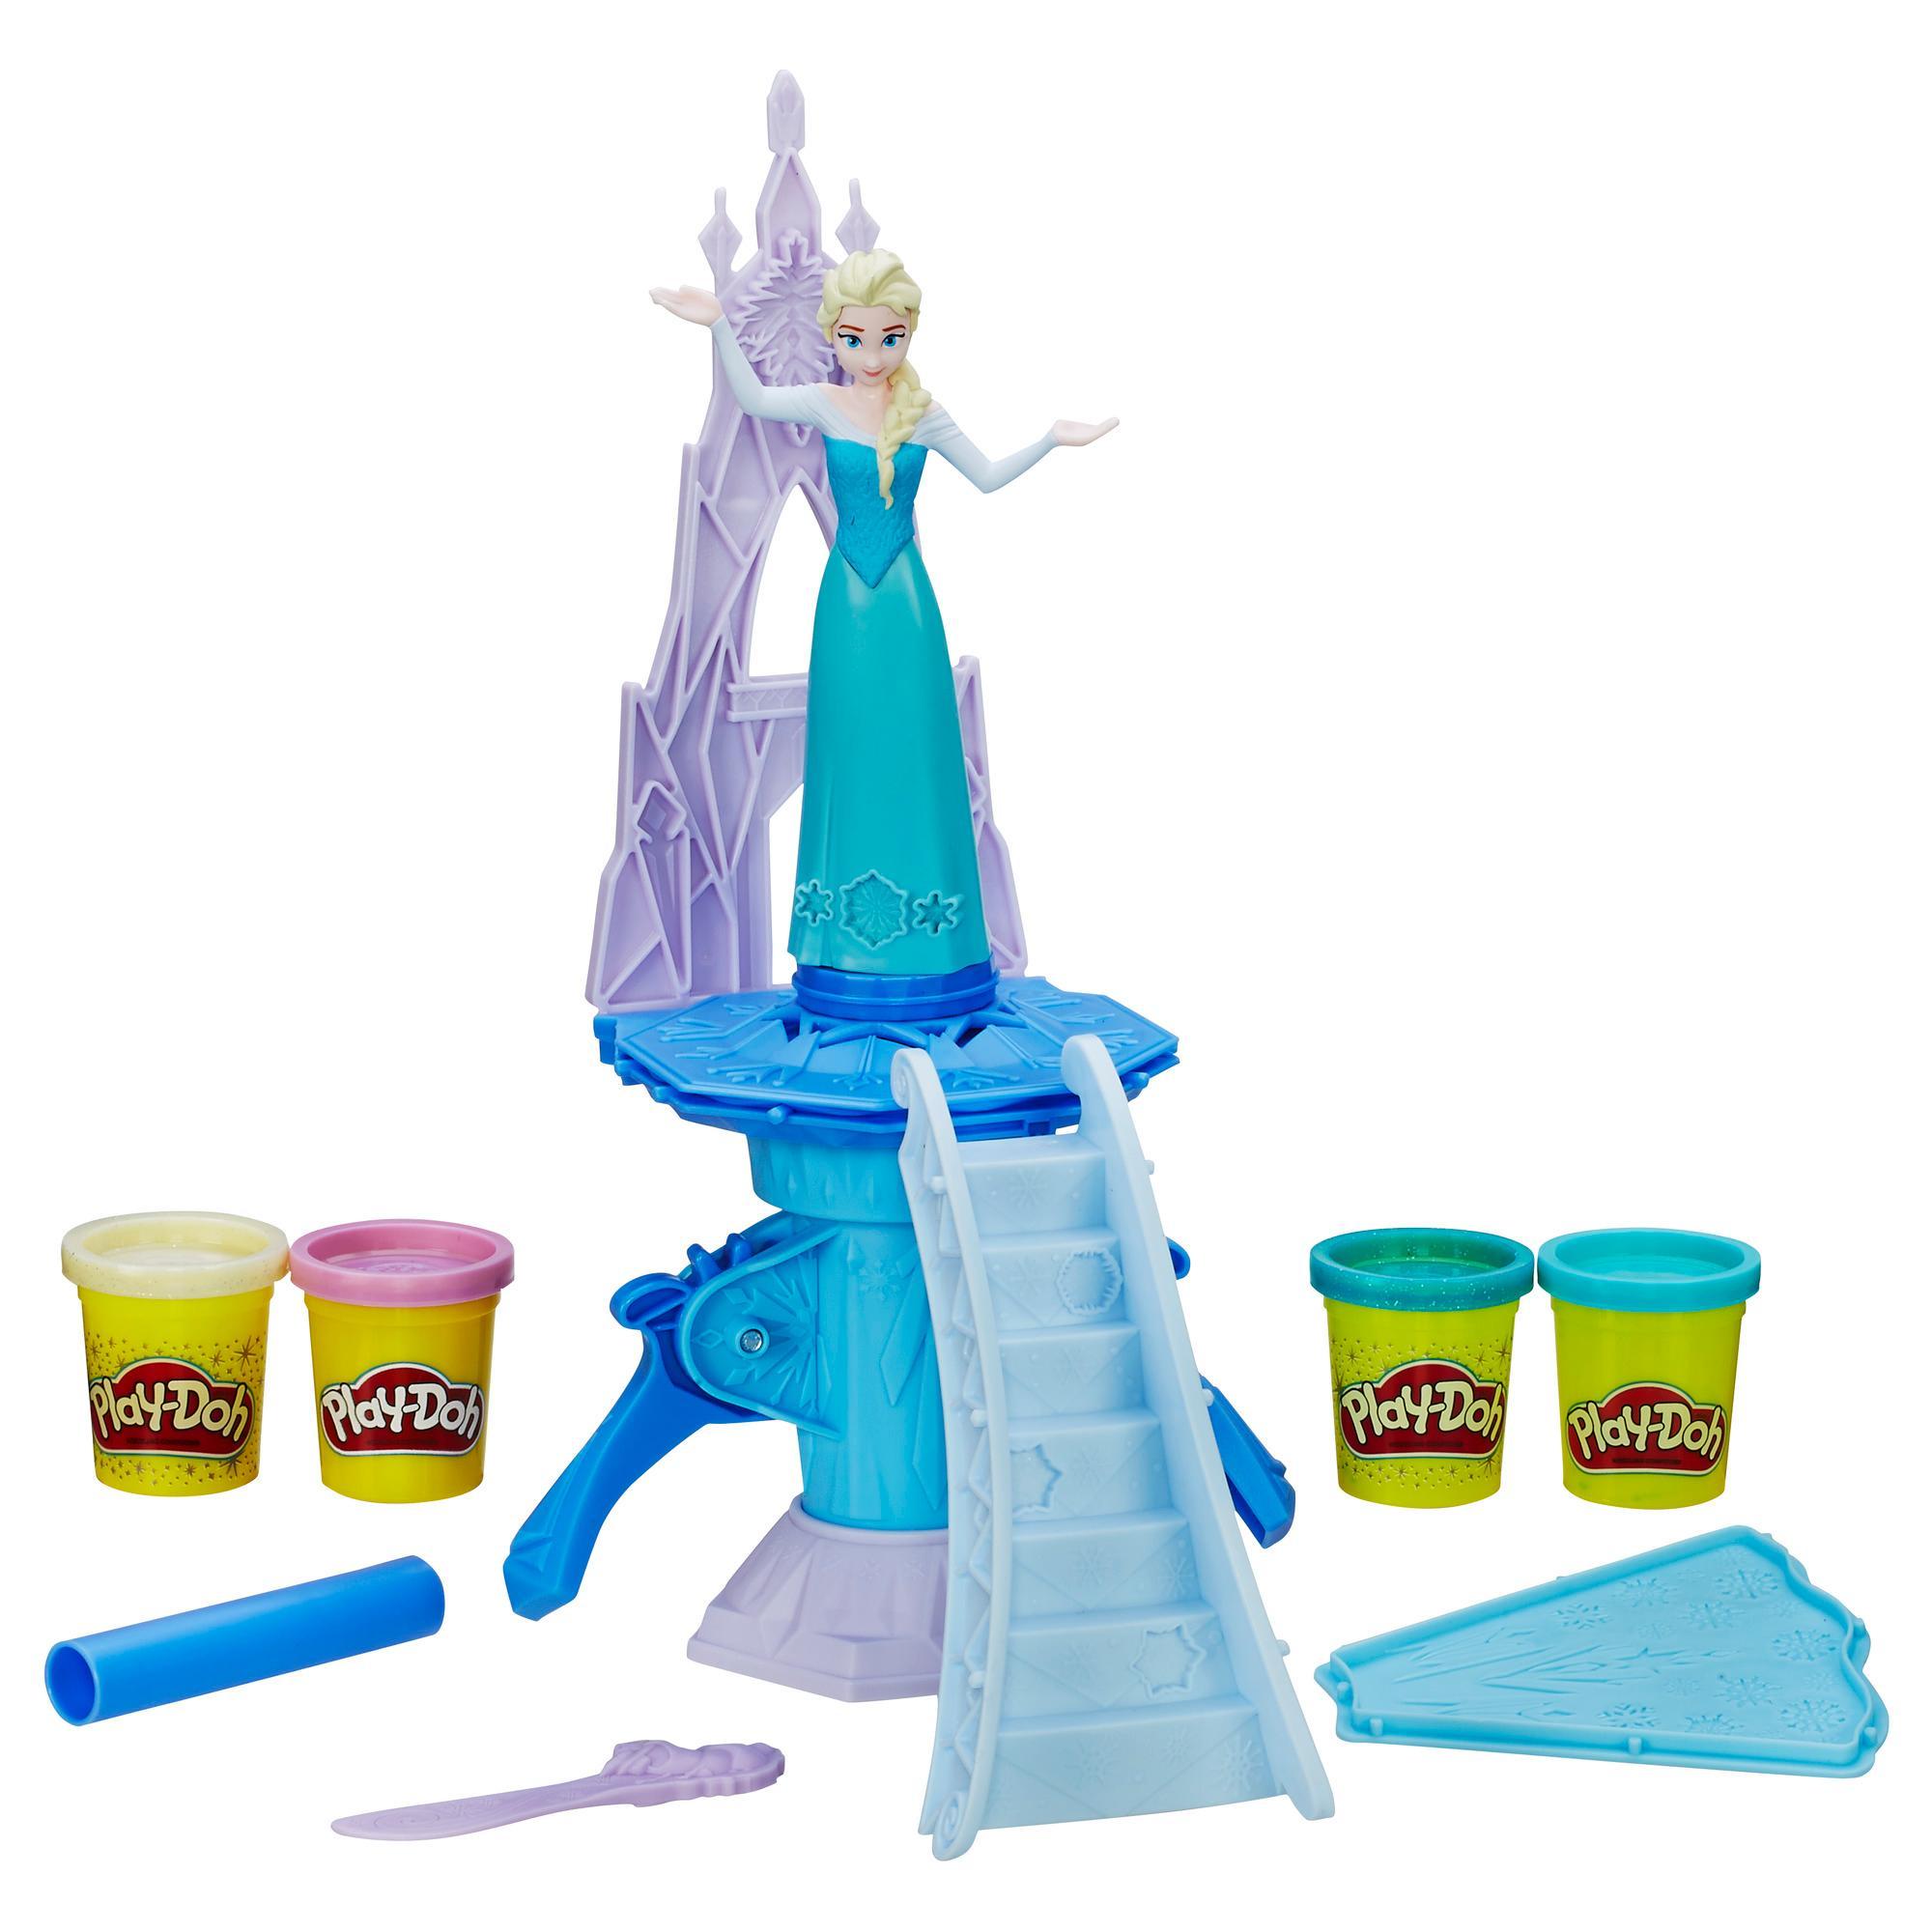 Massinha de Brincar do Palácio de Gelo Encantado do Frozen, Estrelando Elsa